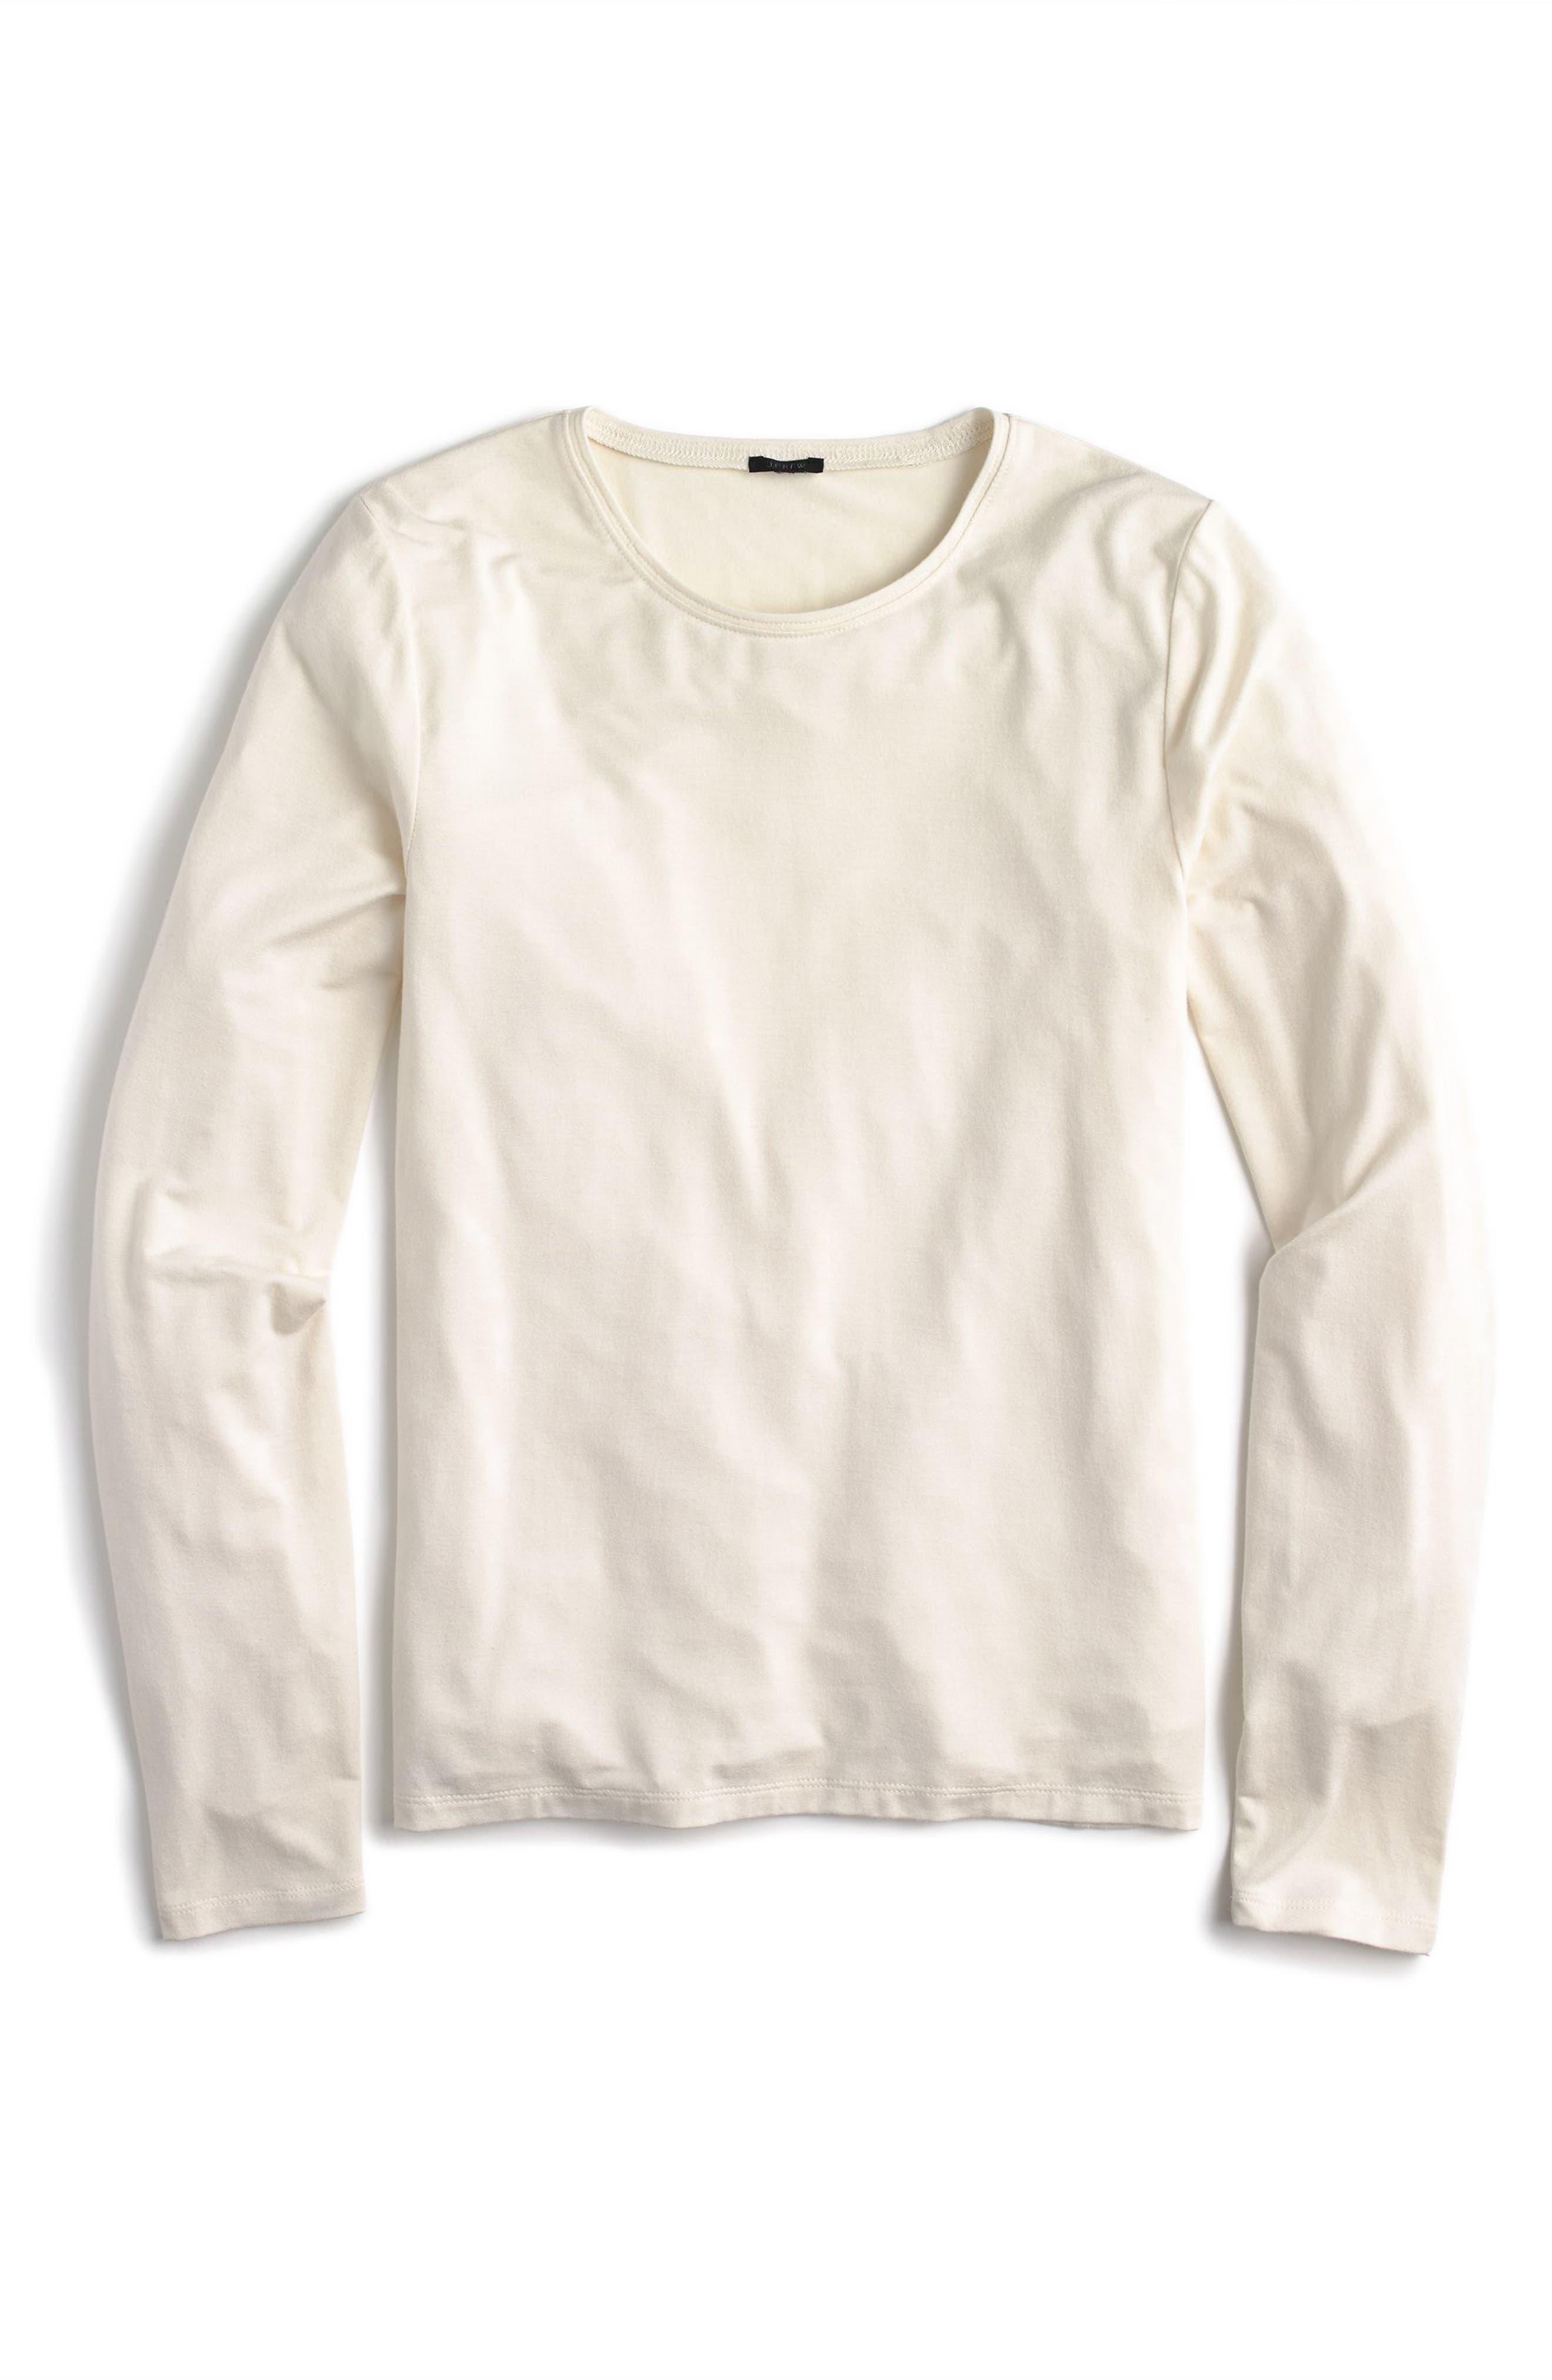 J.Crew Long Sleeve Tee,                         Main,                         color, Fresh Linen